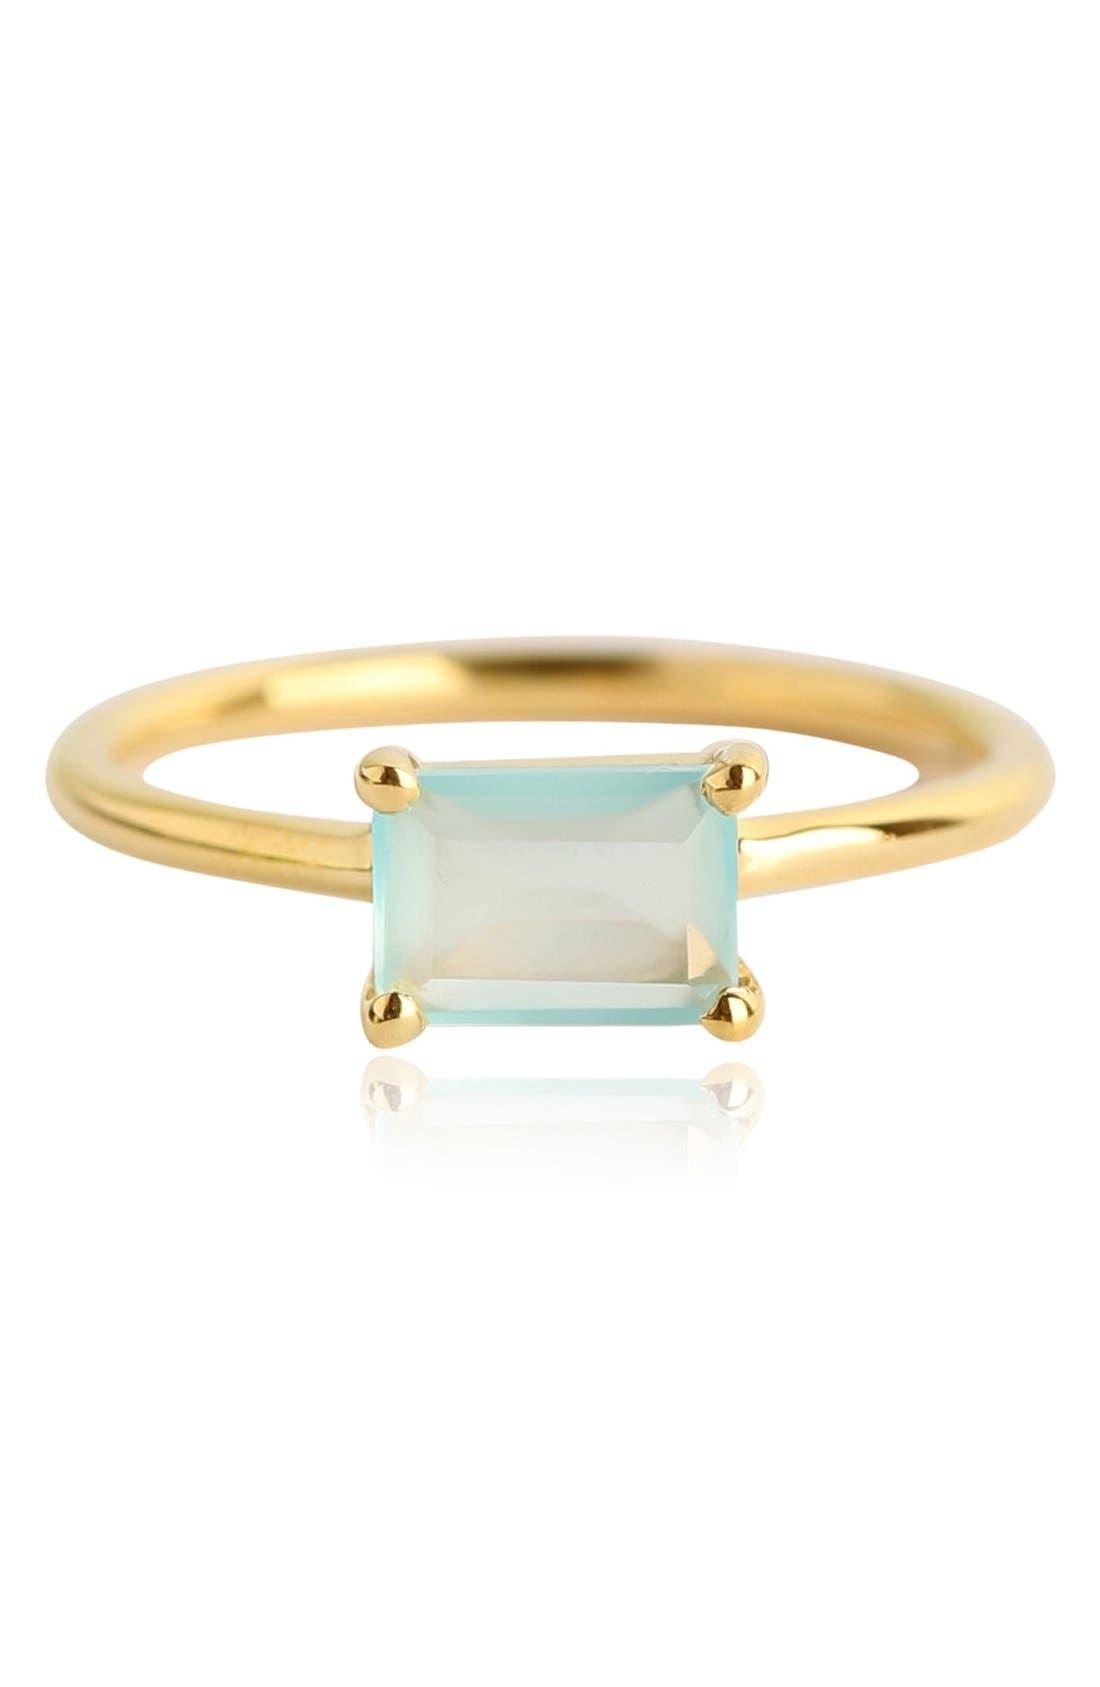 Alternate Image 1 Selected - Leah Alexandra Baguette Stone Ring